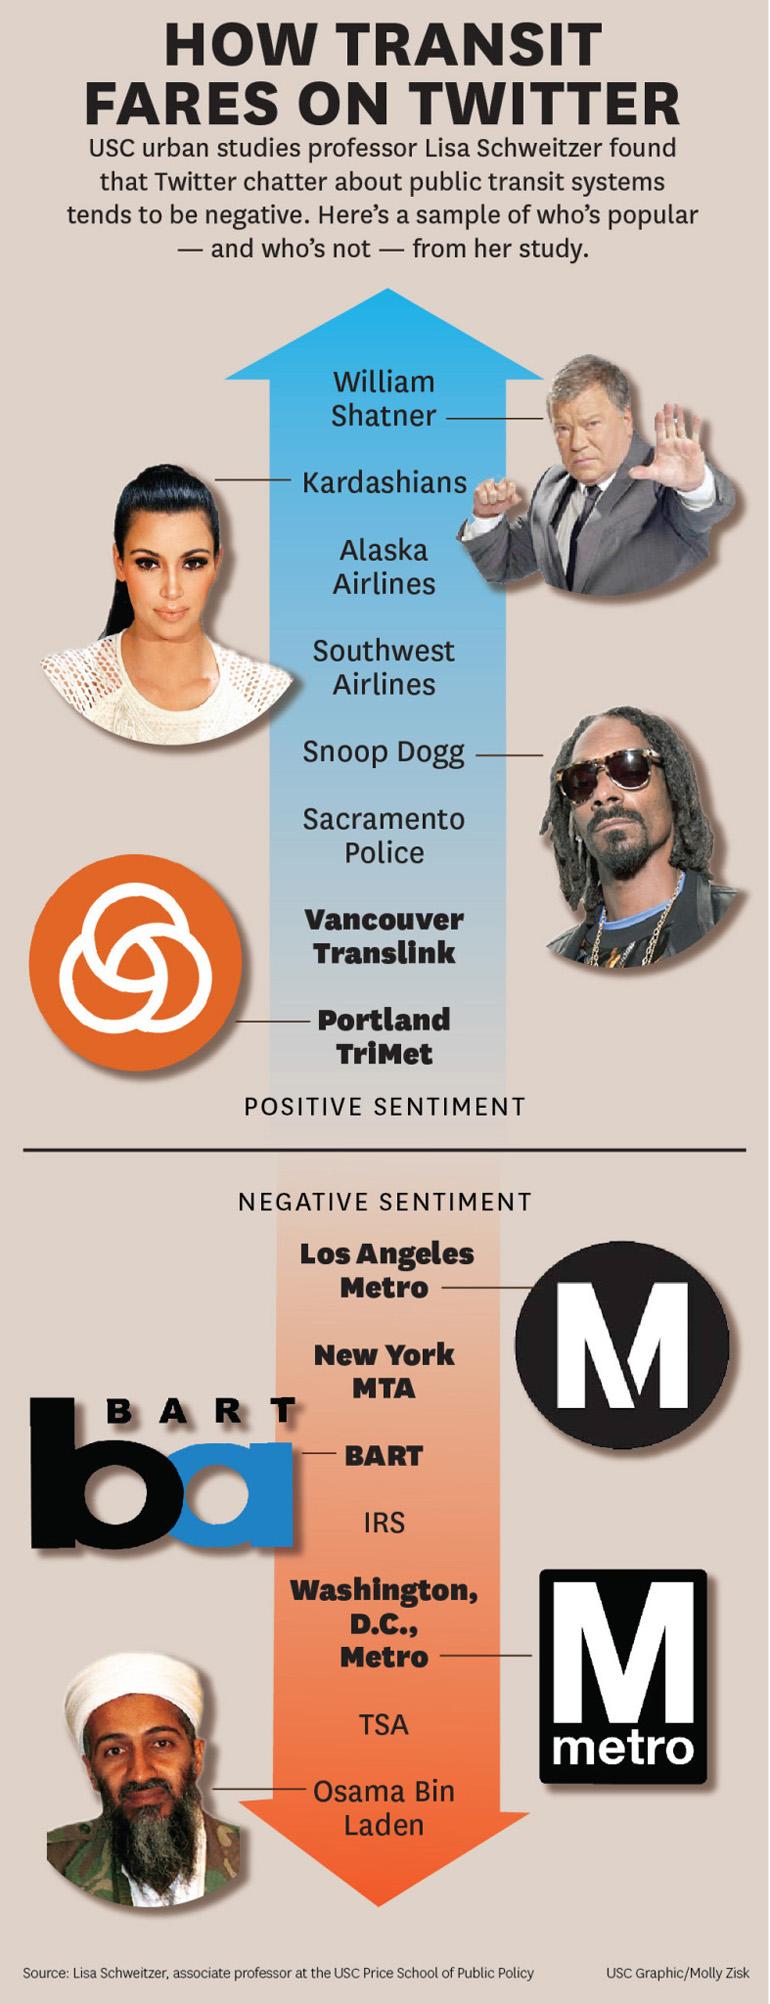 transit twitter hatred infographic